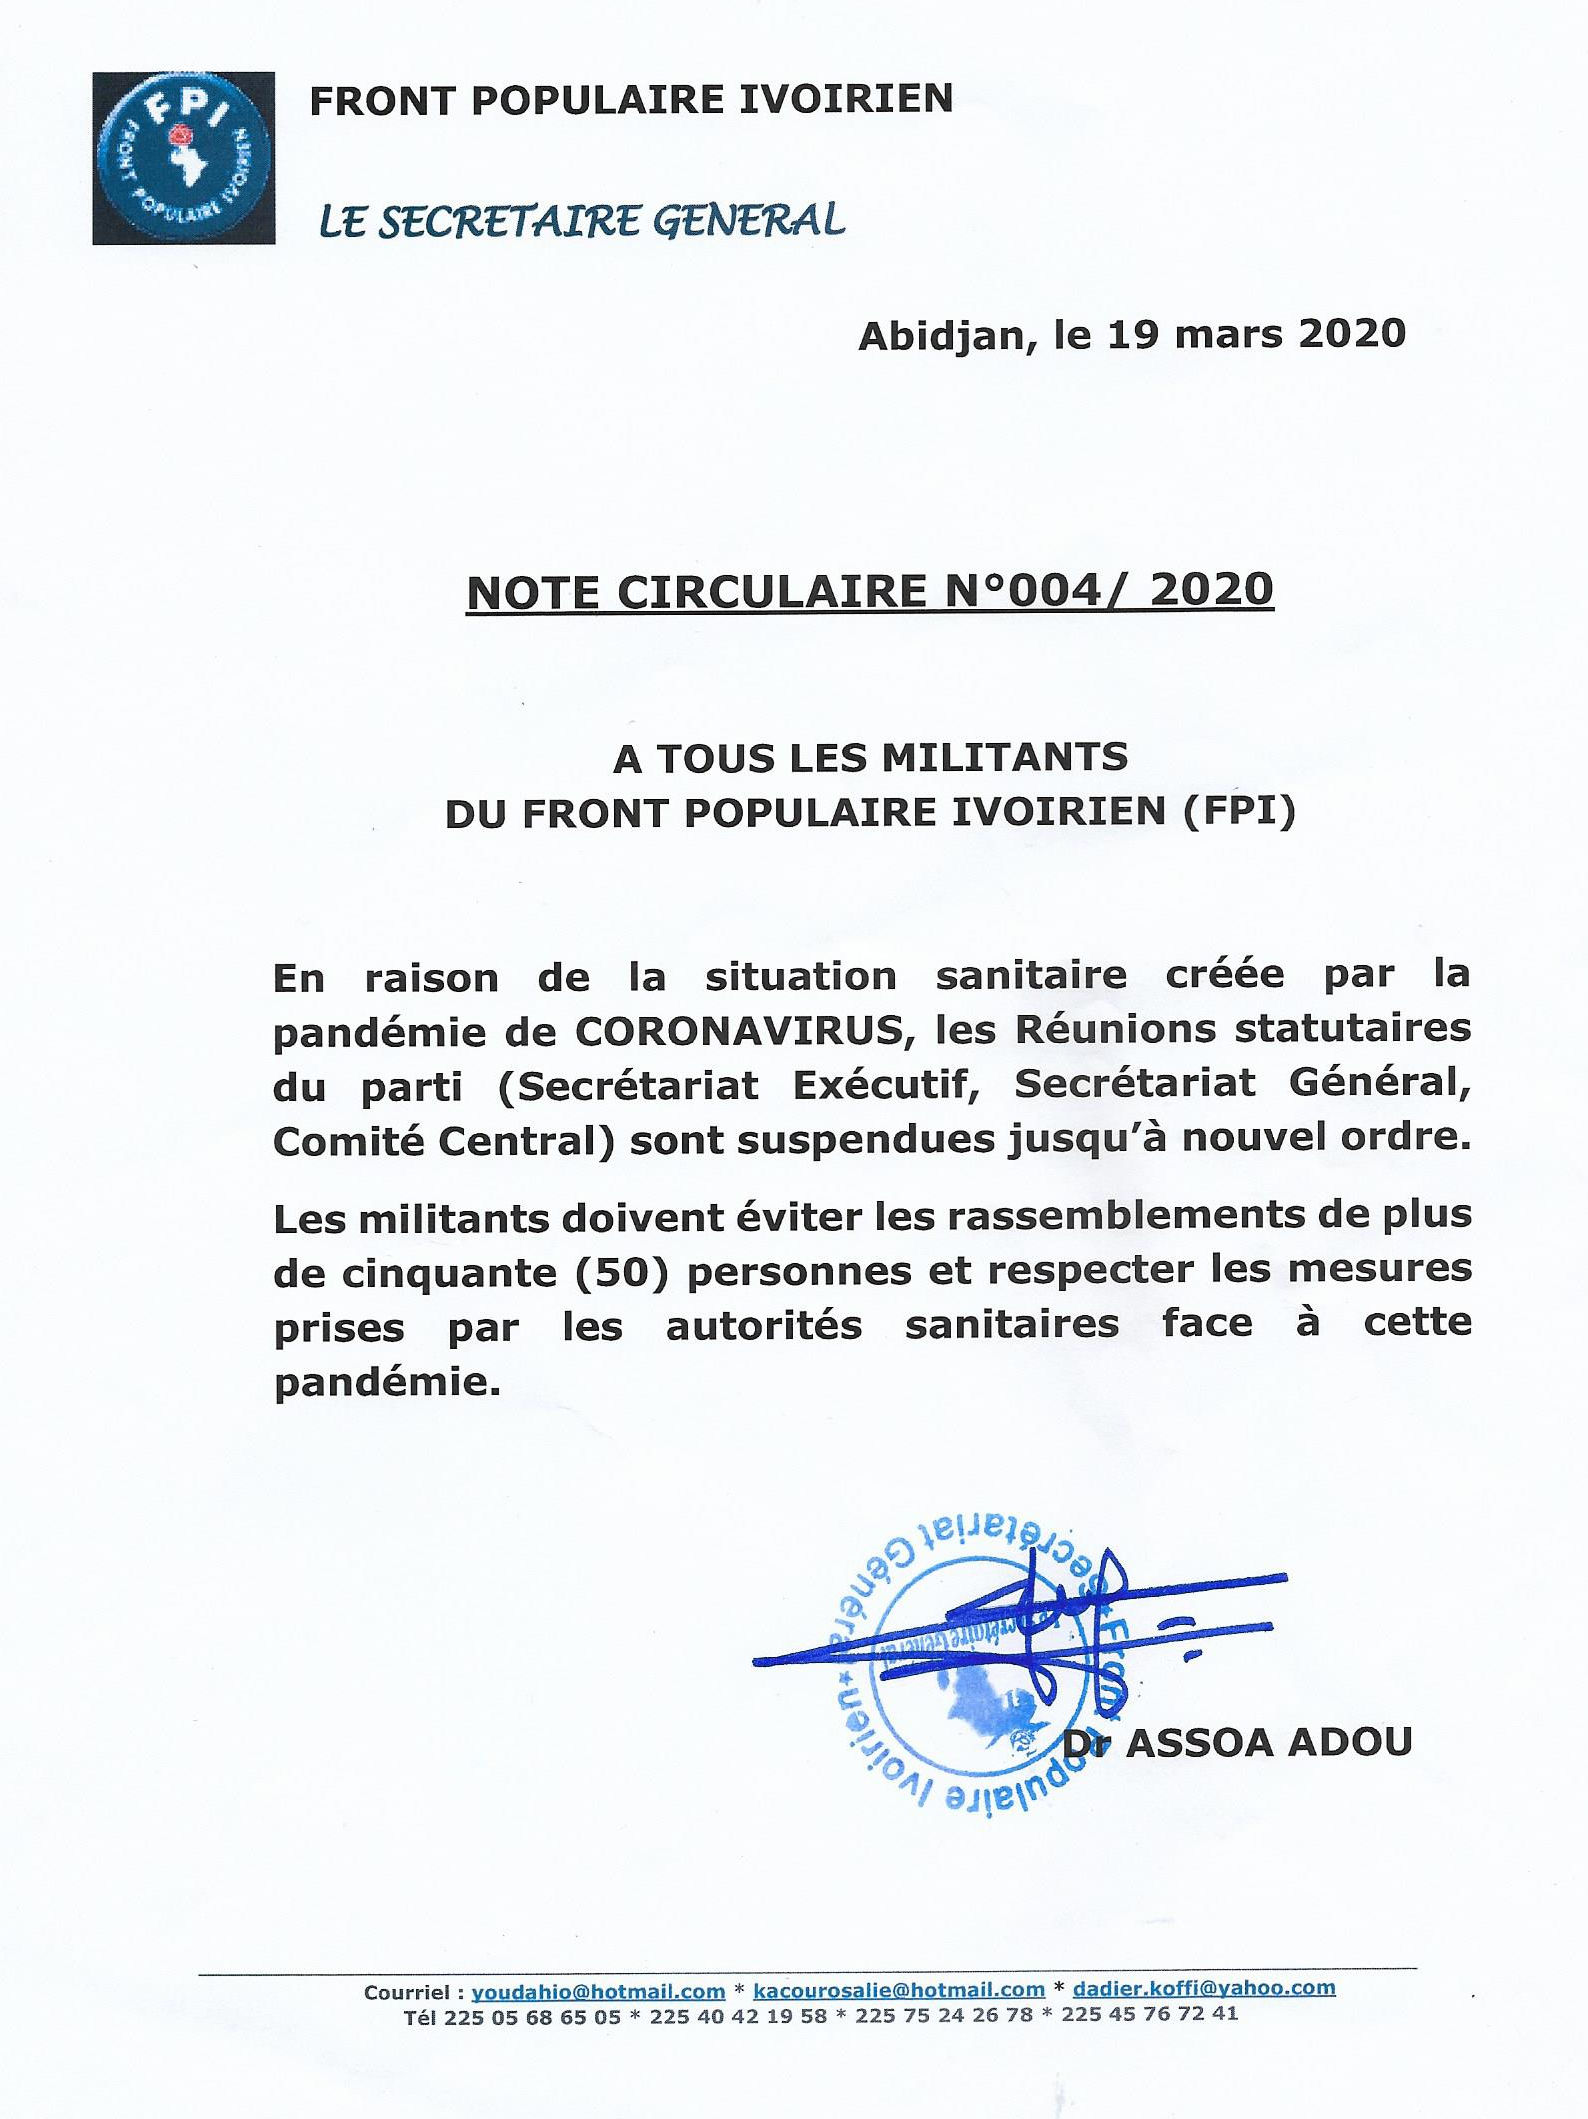 img.23.03.2020f